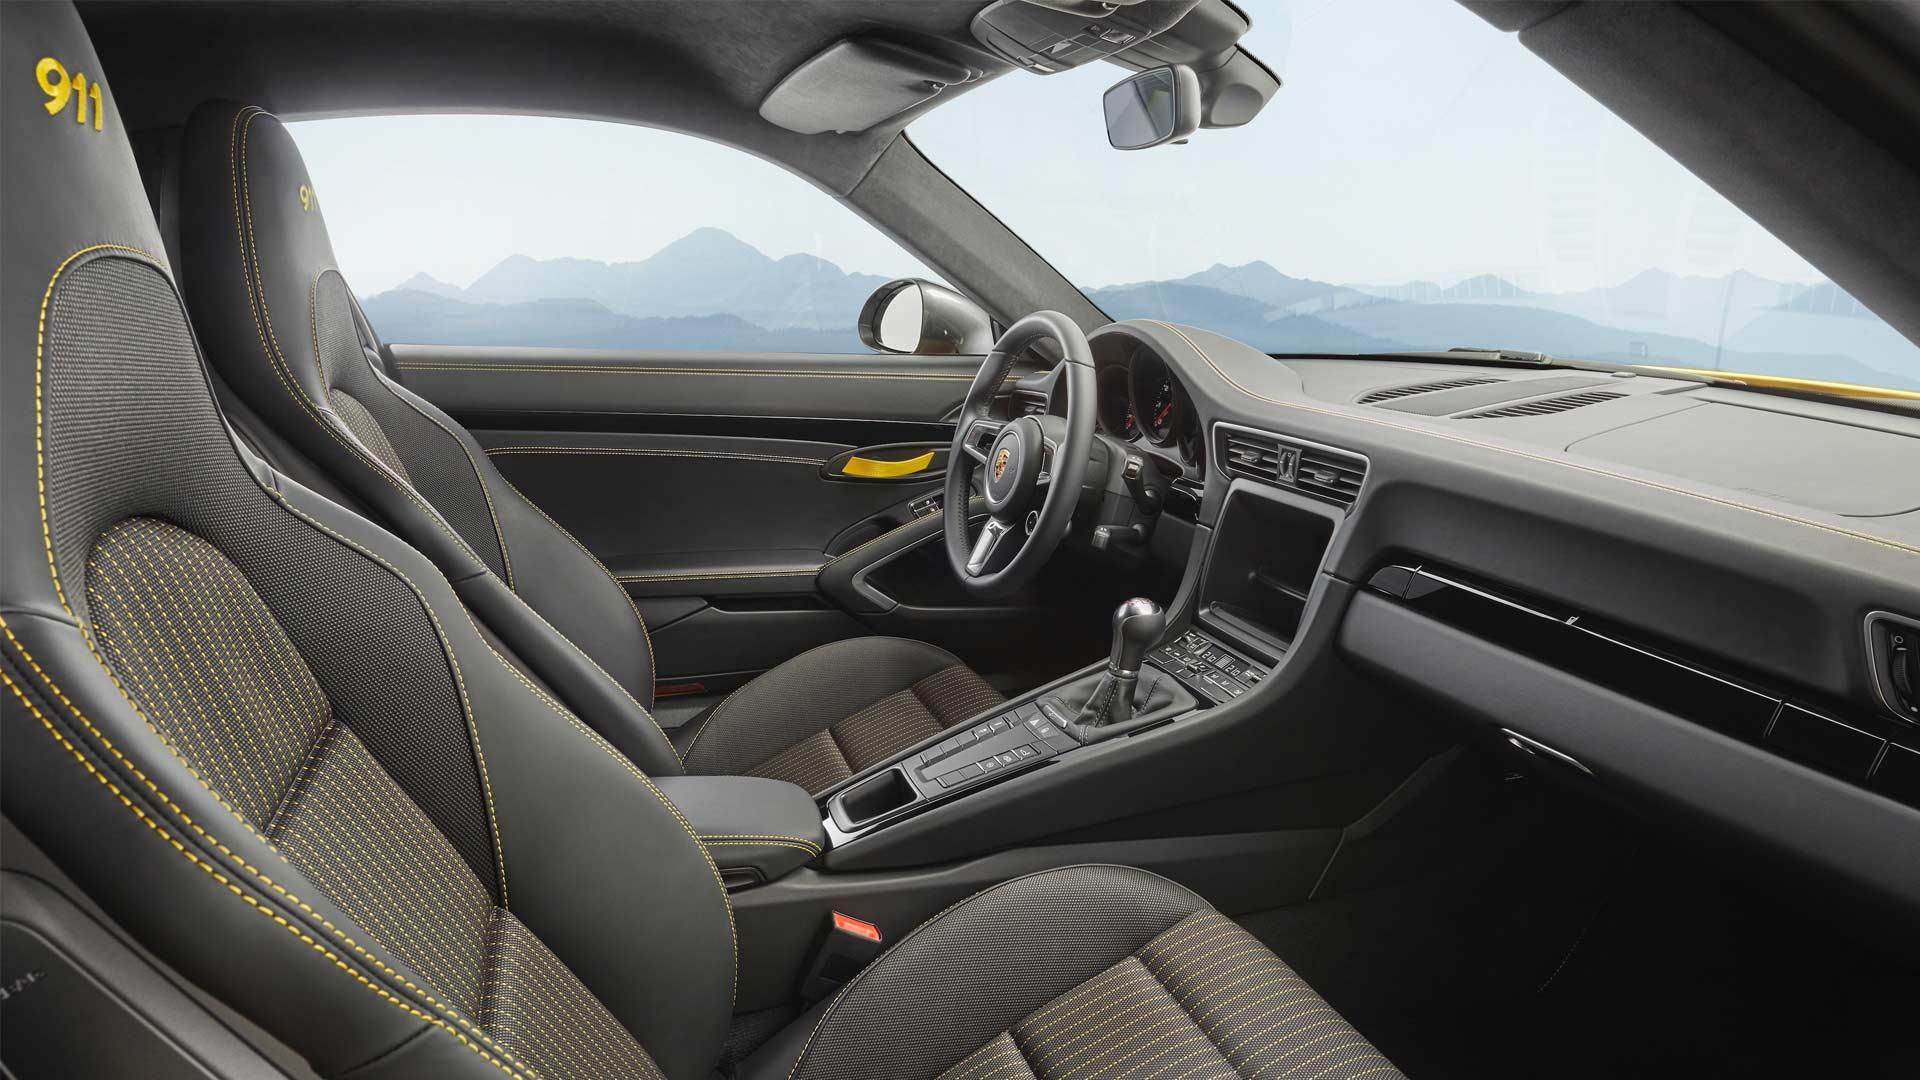 2018-Porsche-Carrera-T-Interior_2